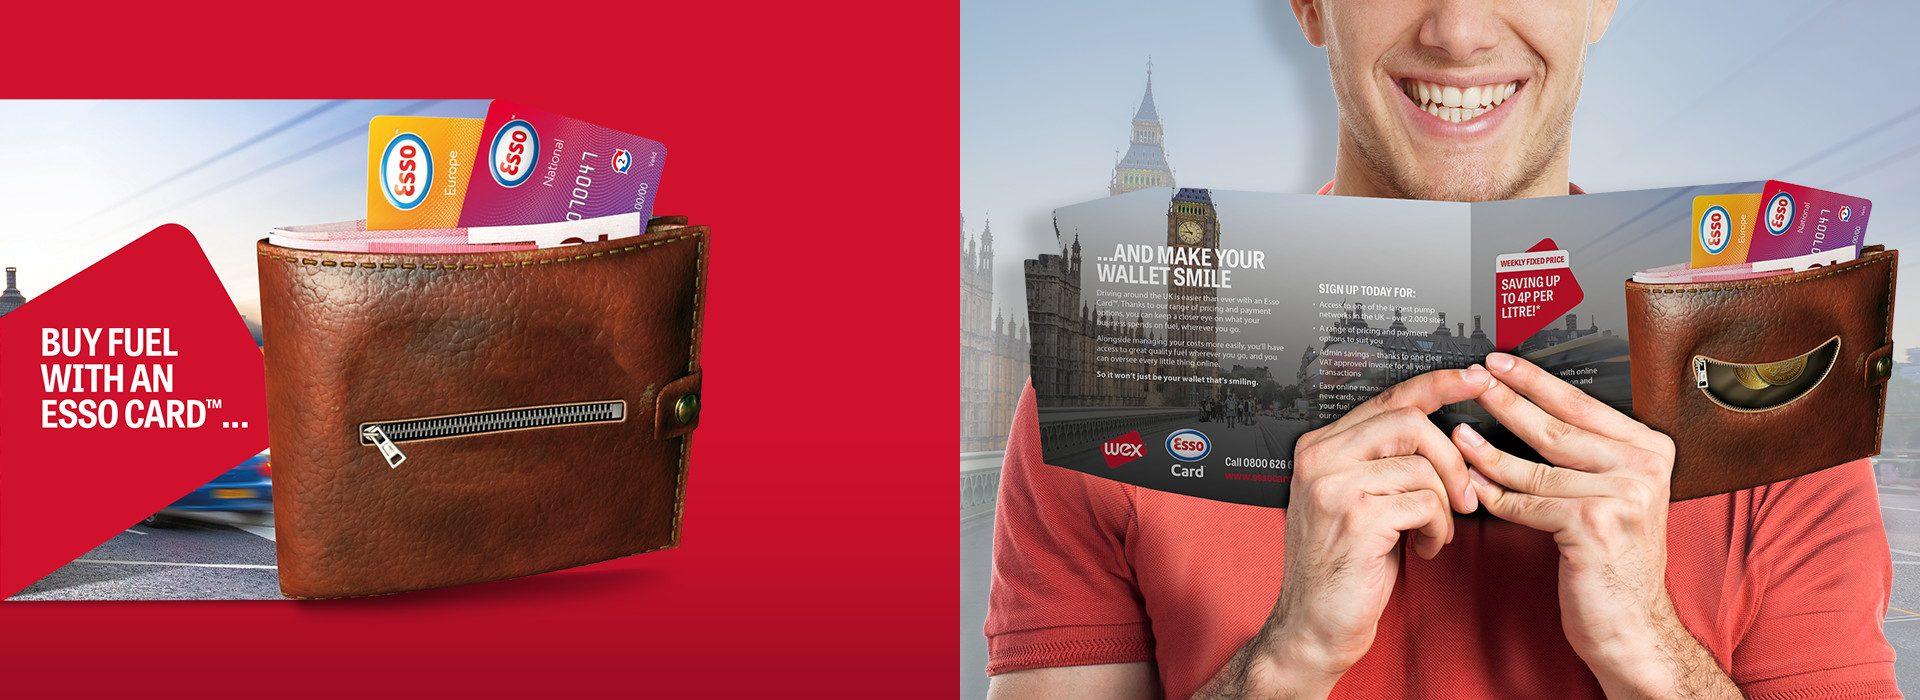 e47bdf7aad Pan European B2B marketing campaign for Esso Fuel Card